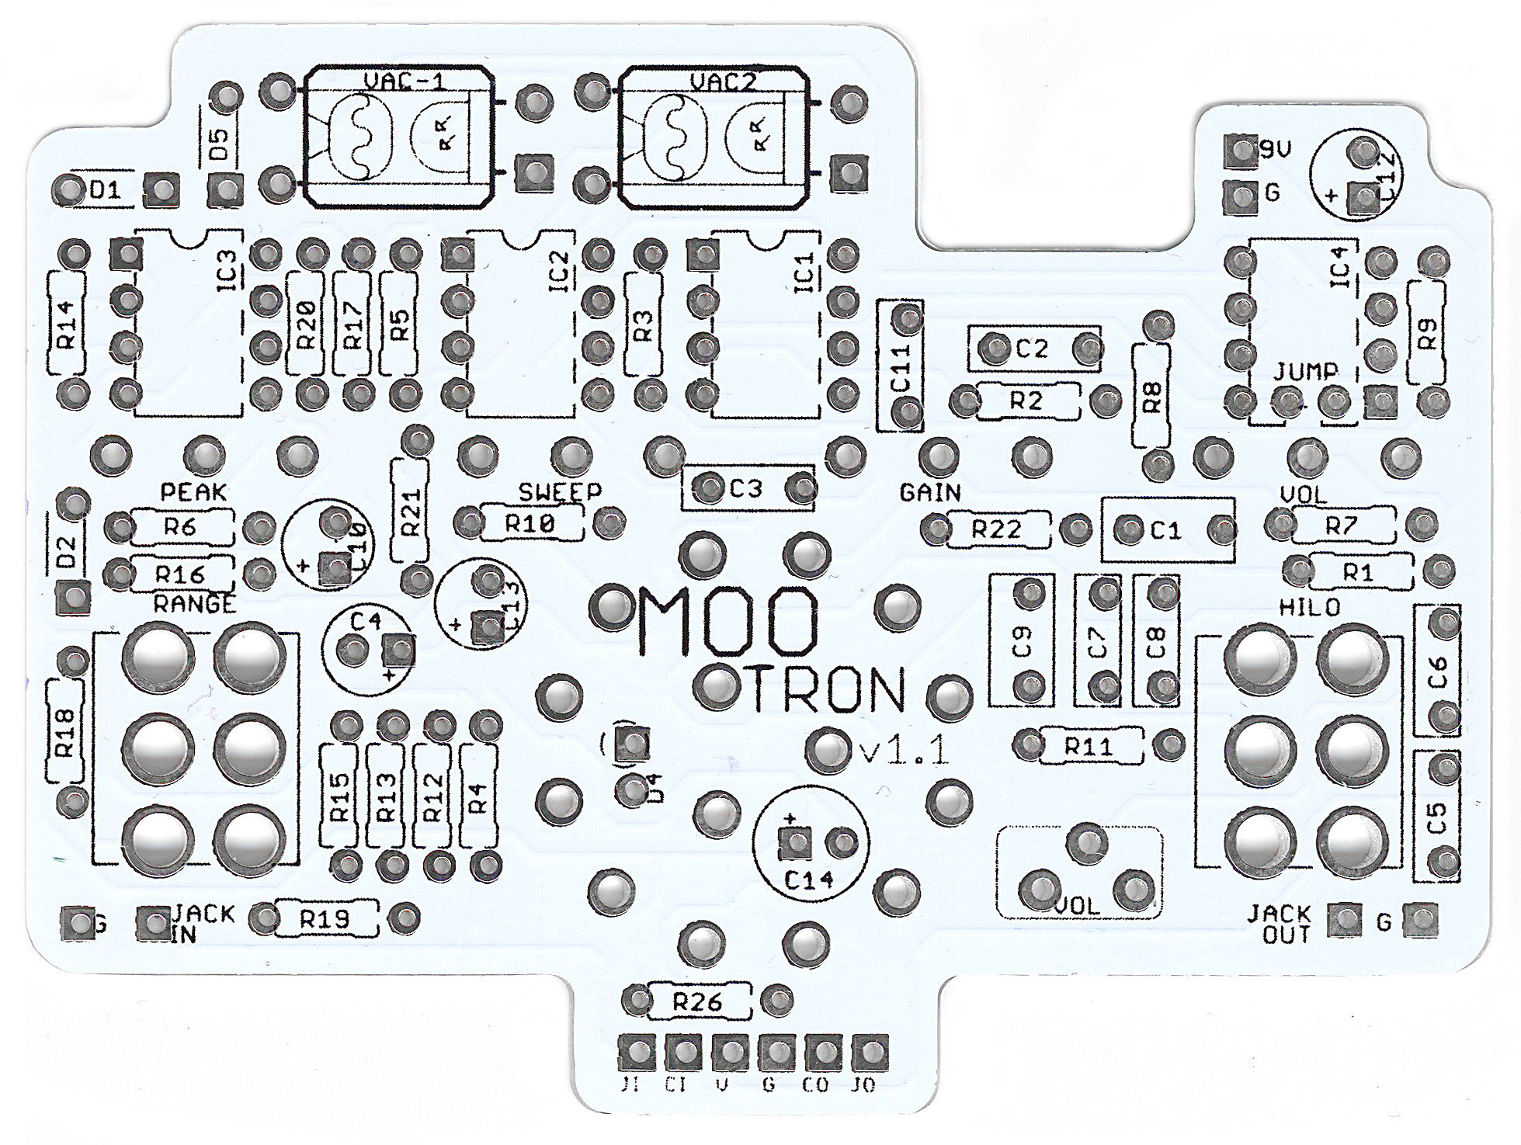 Moo-Tron Auto Filter PCB